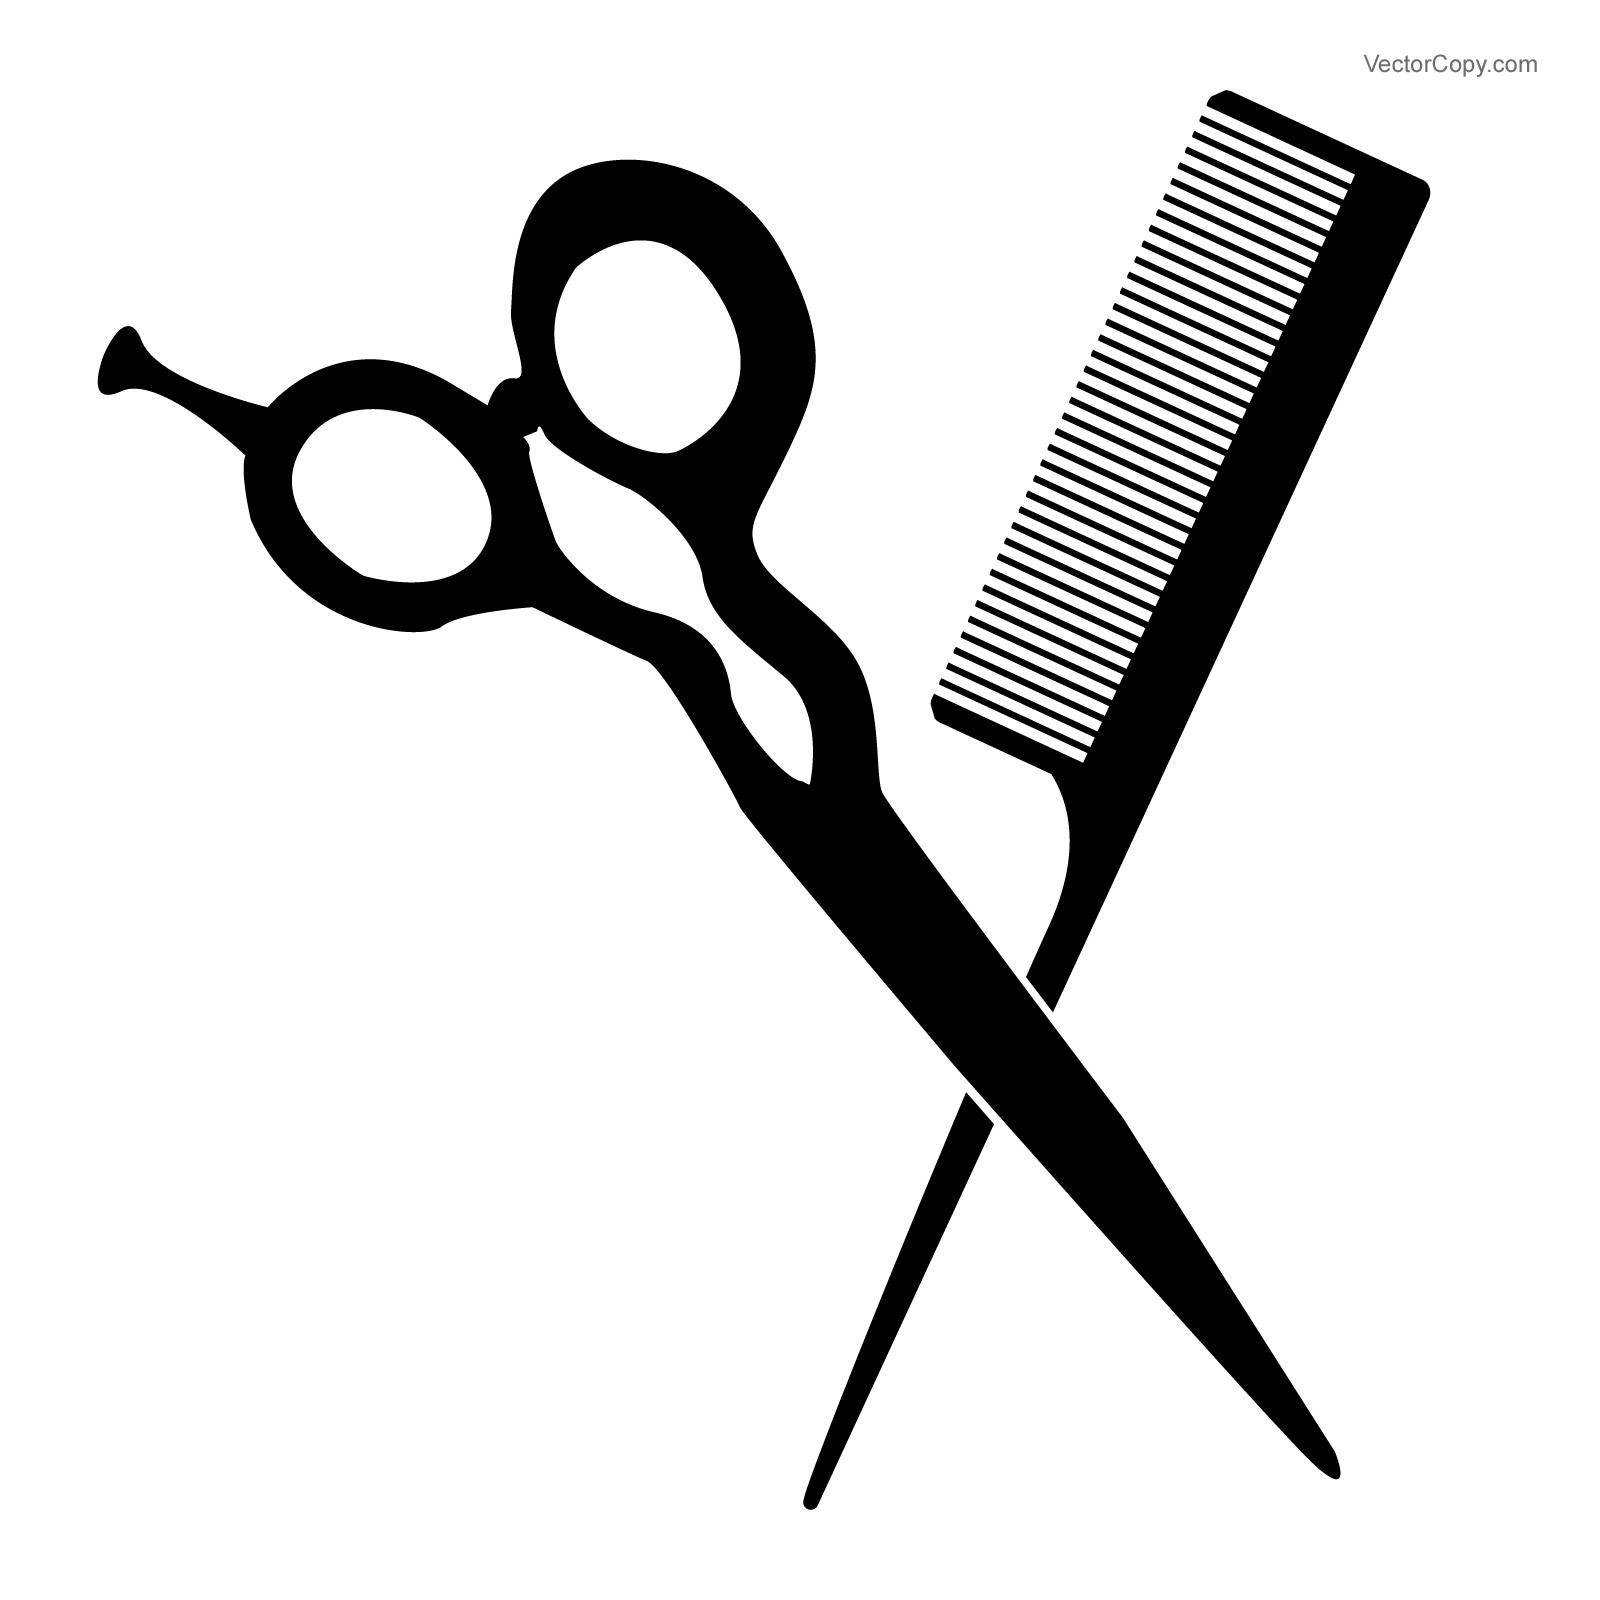 Scissors free scissor andb clip art 2